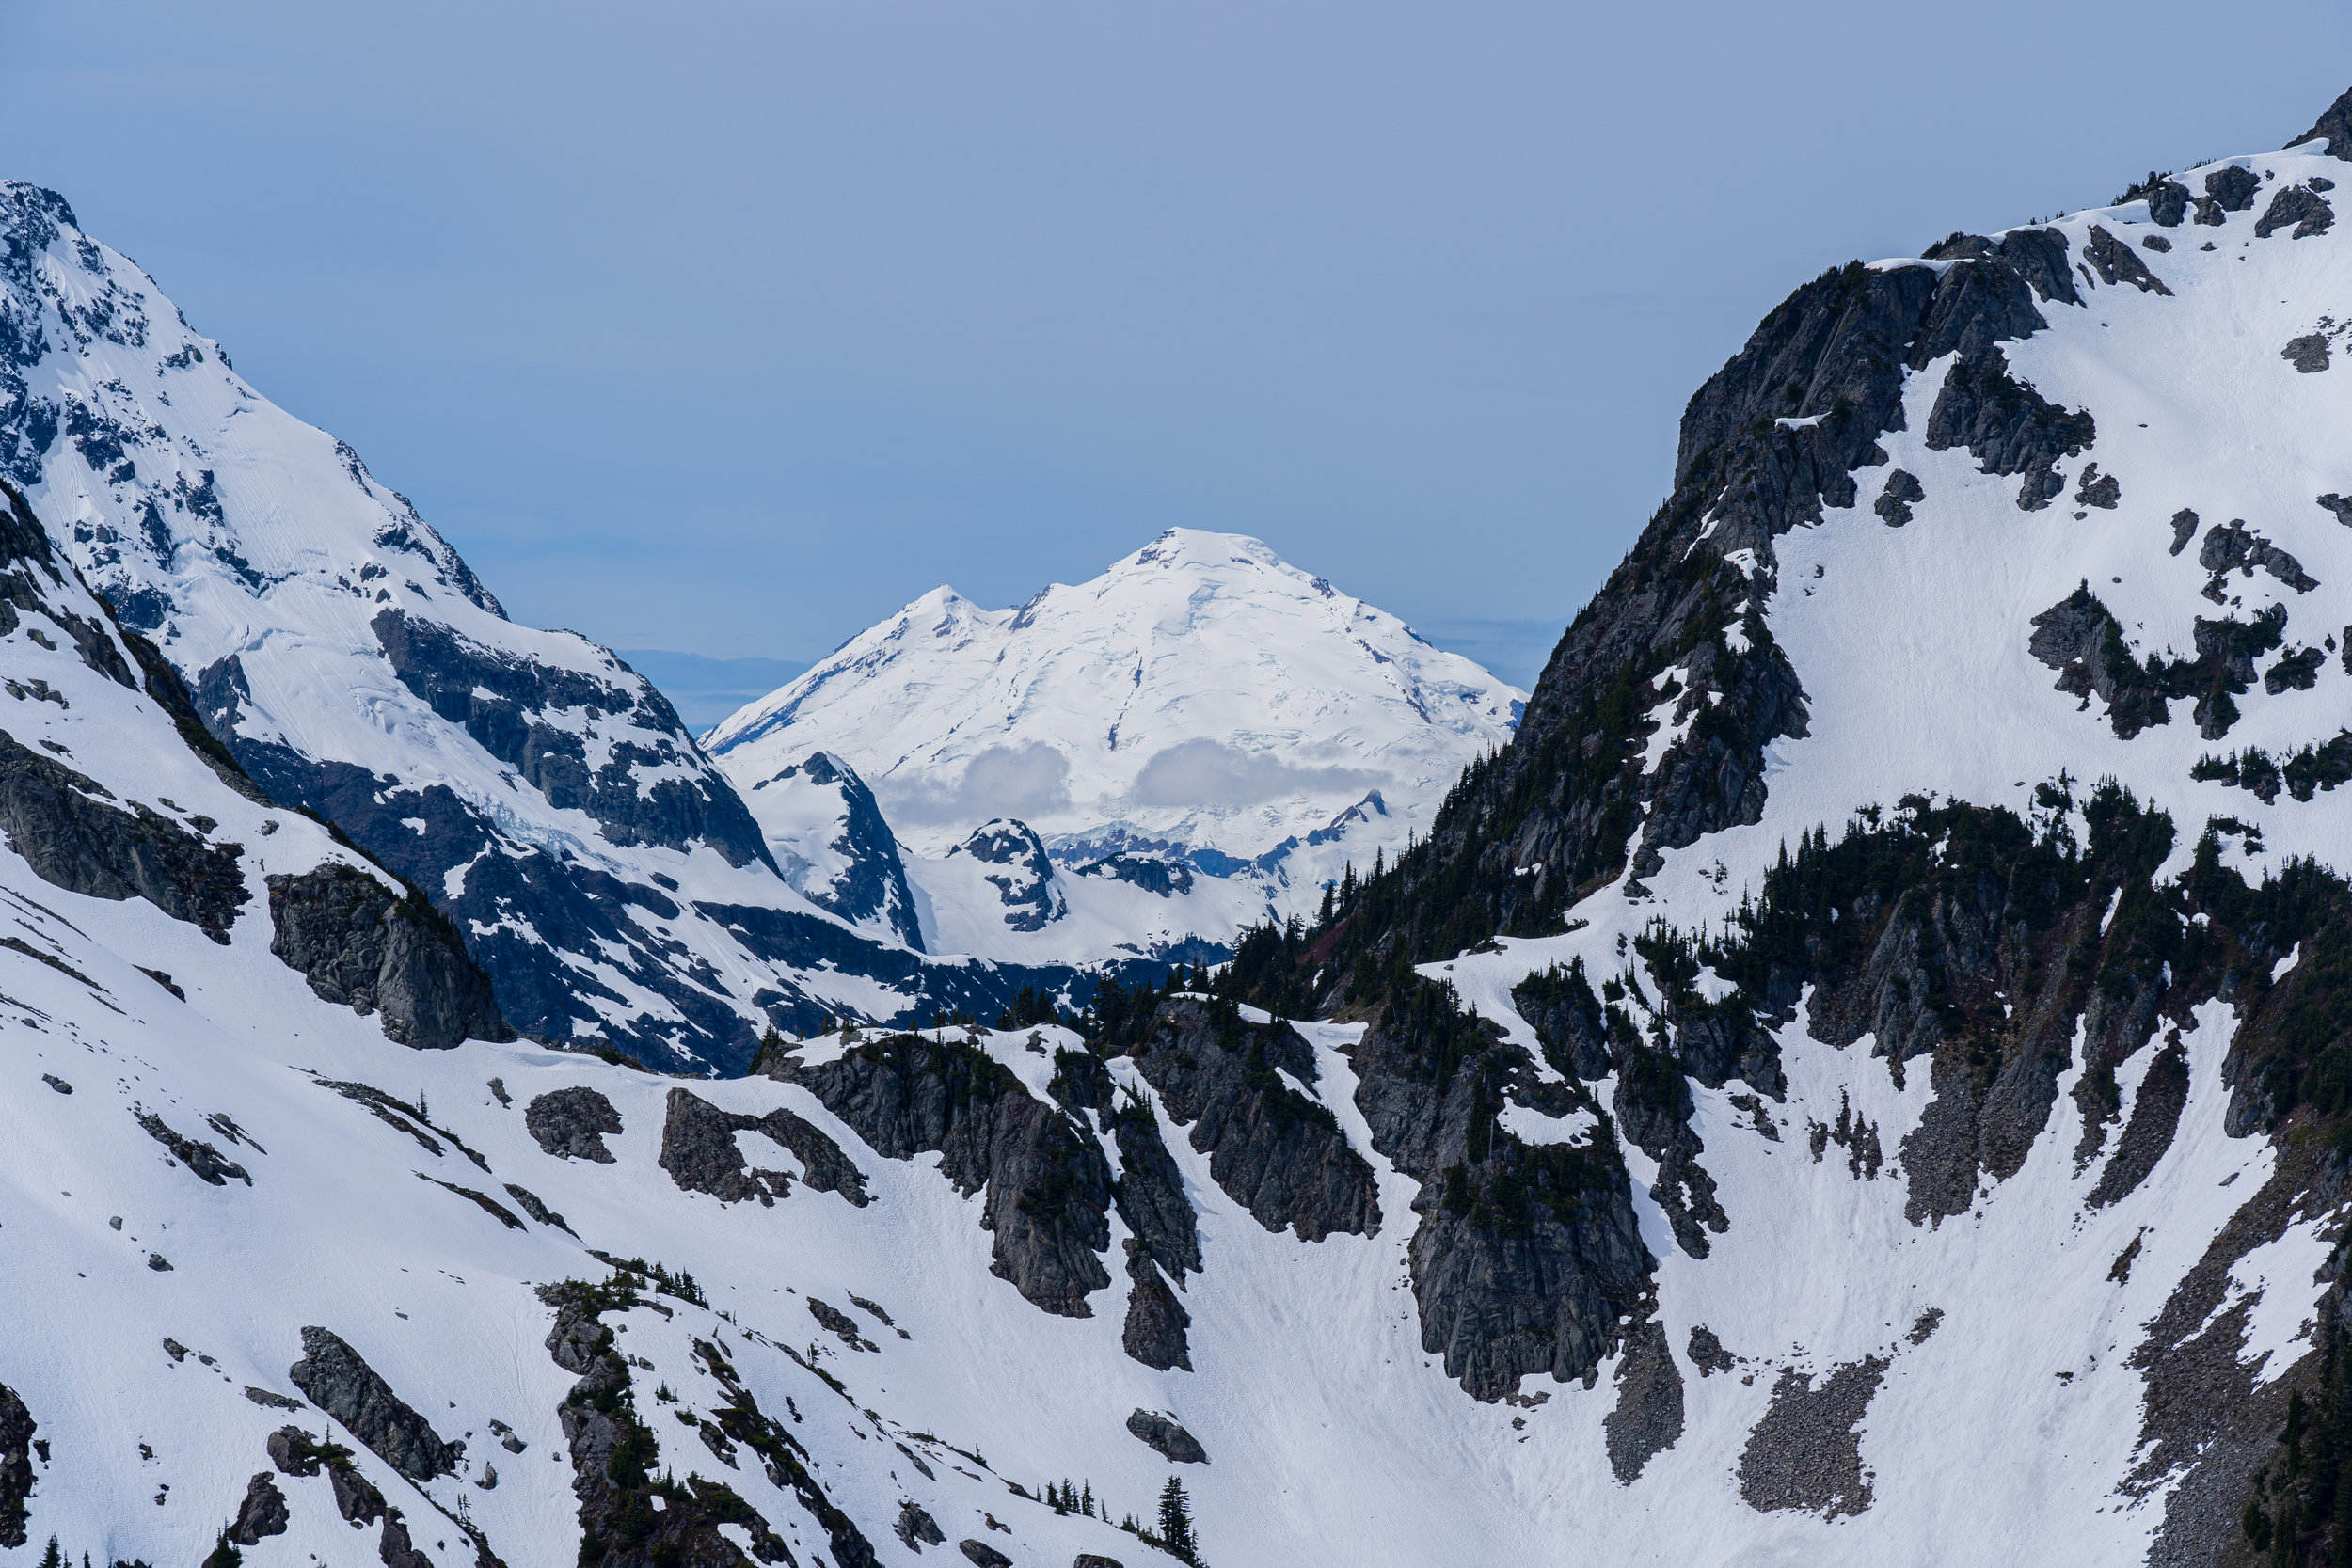 Mt. Baker perfectly framed